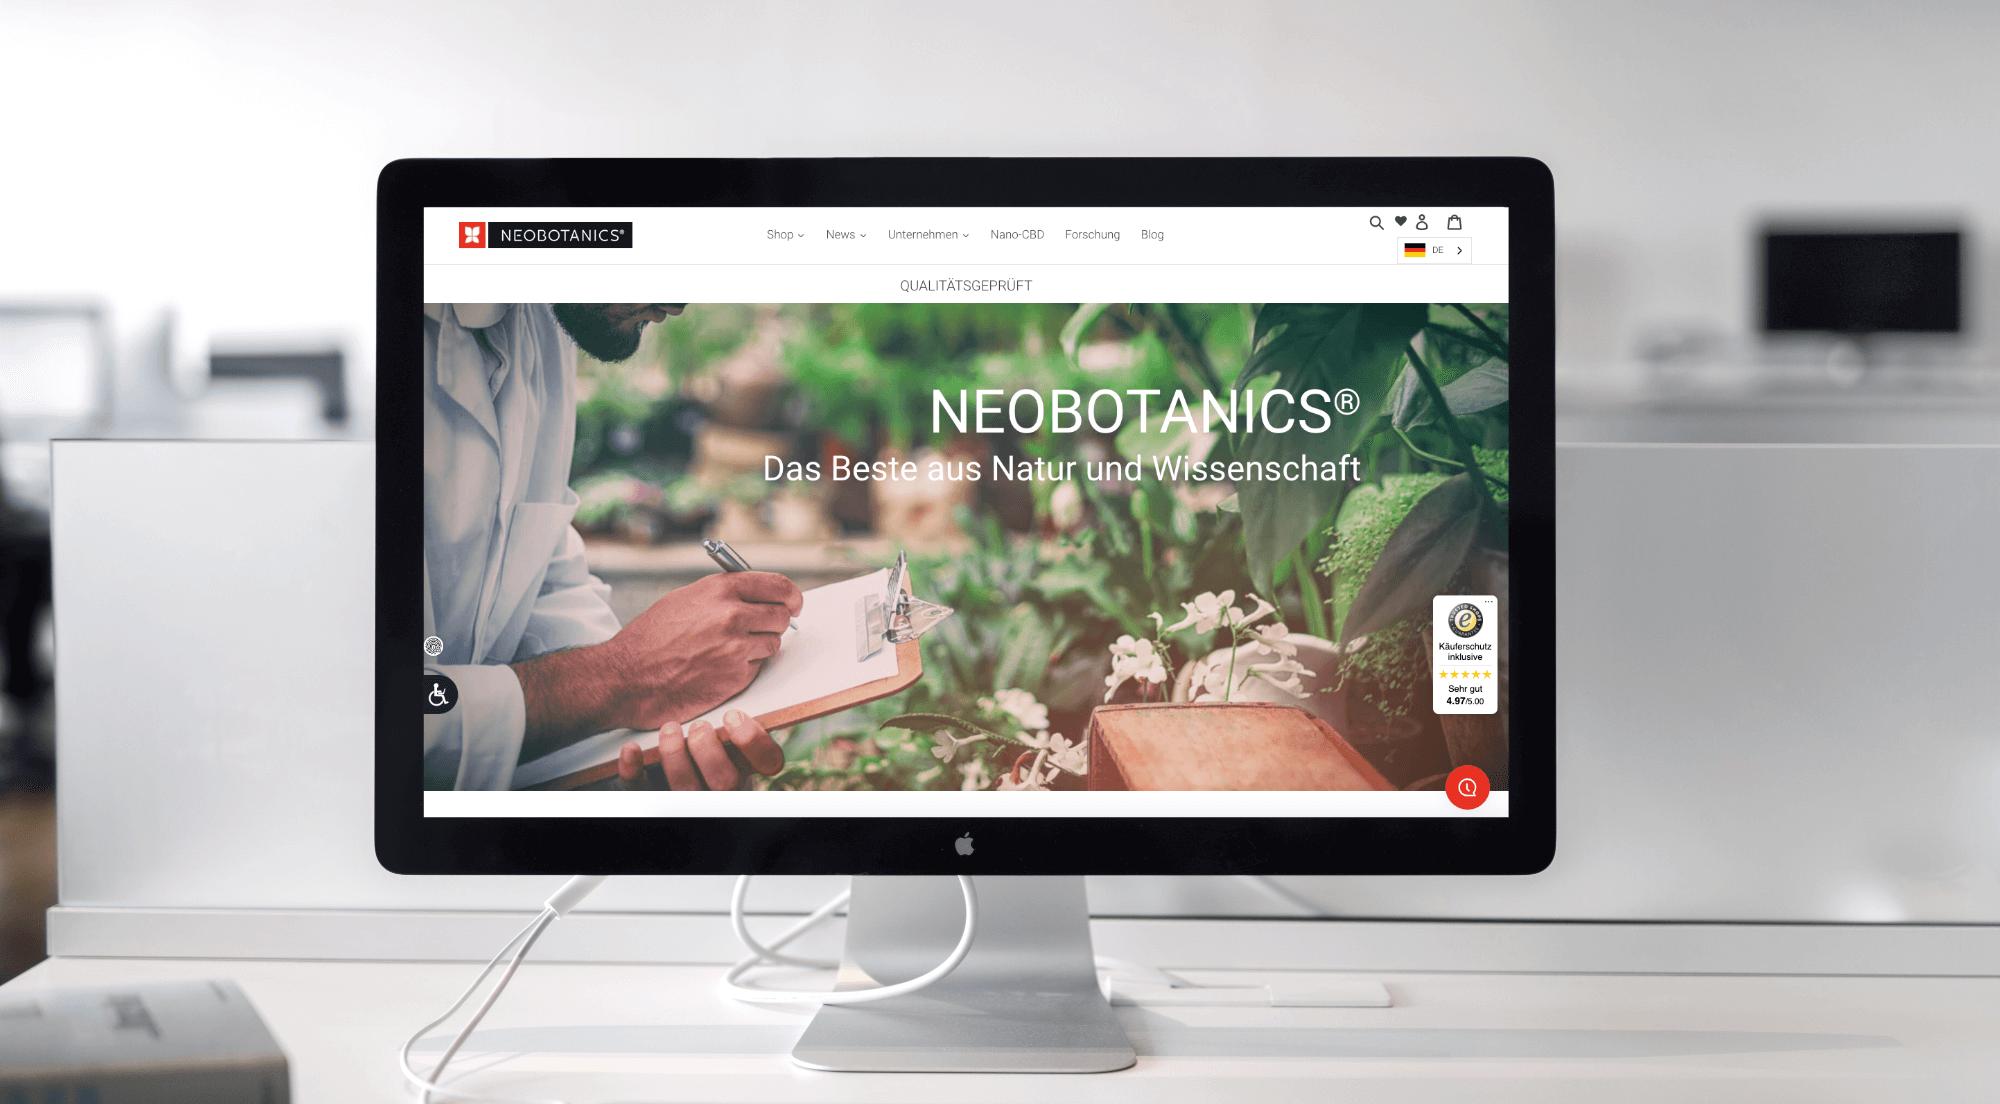 Neobotanics Image